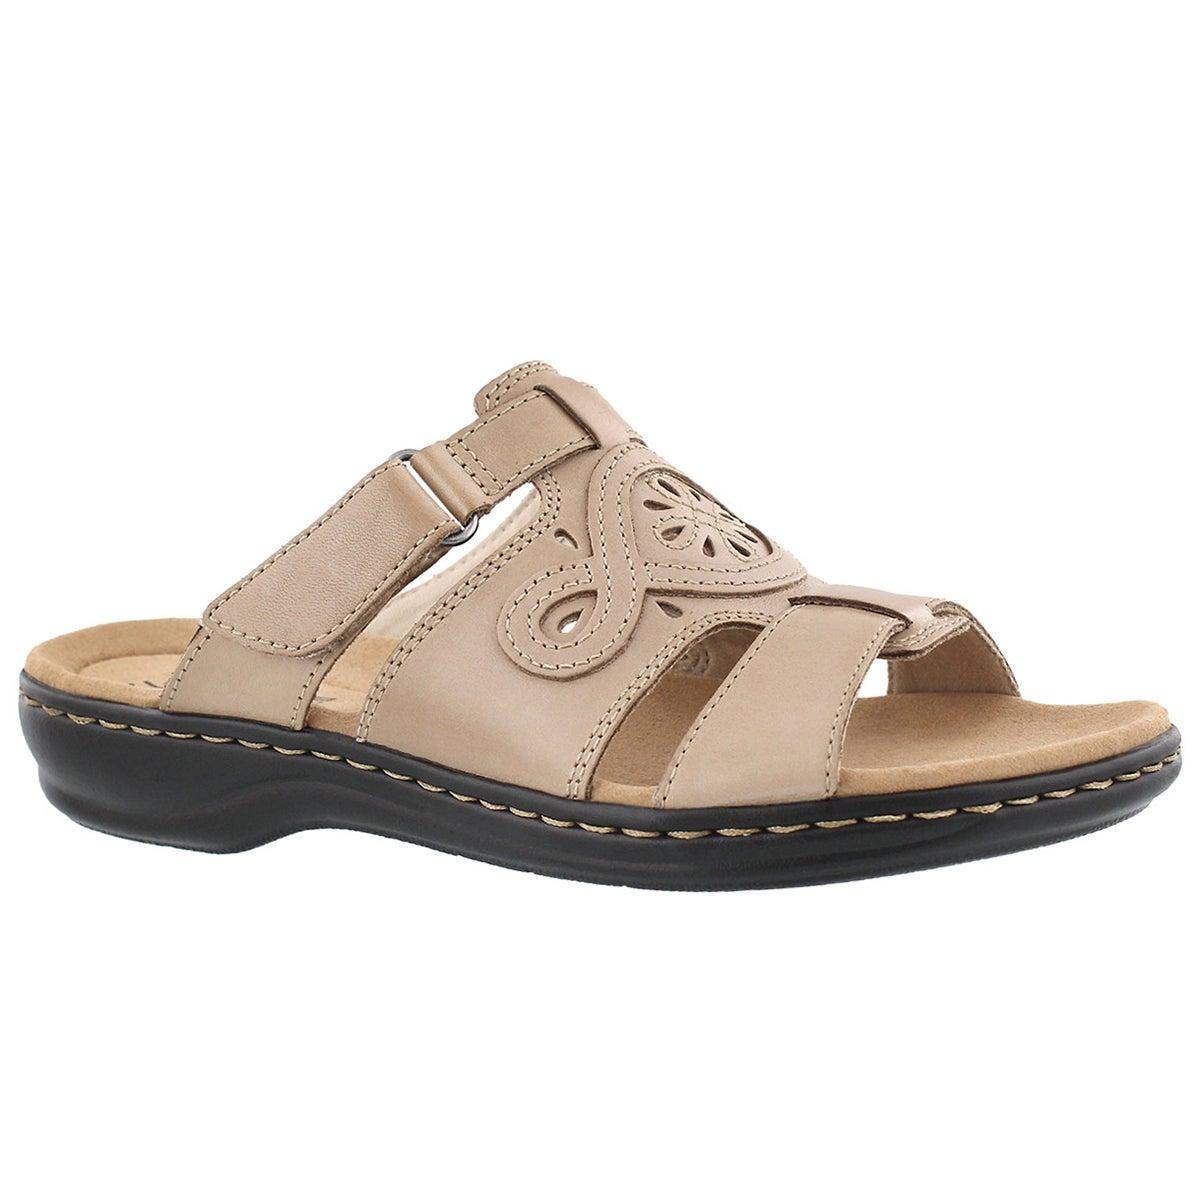 Women's LEISA HIGLEY sand casual slide sandals